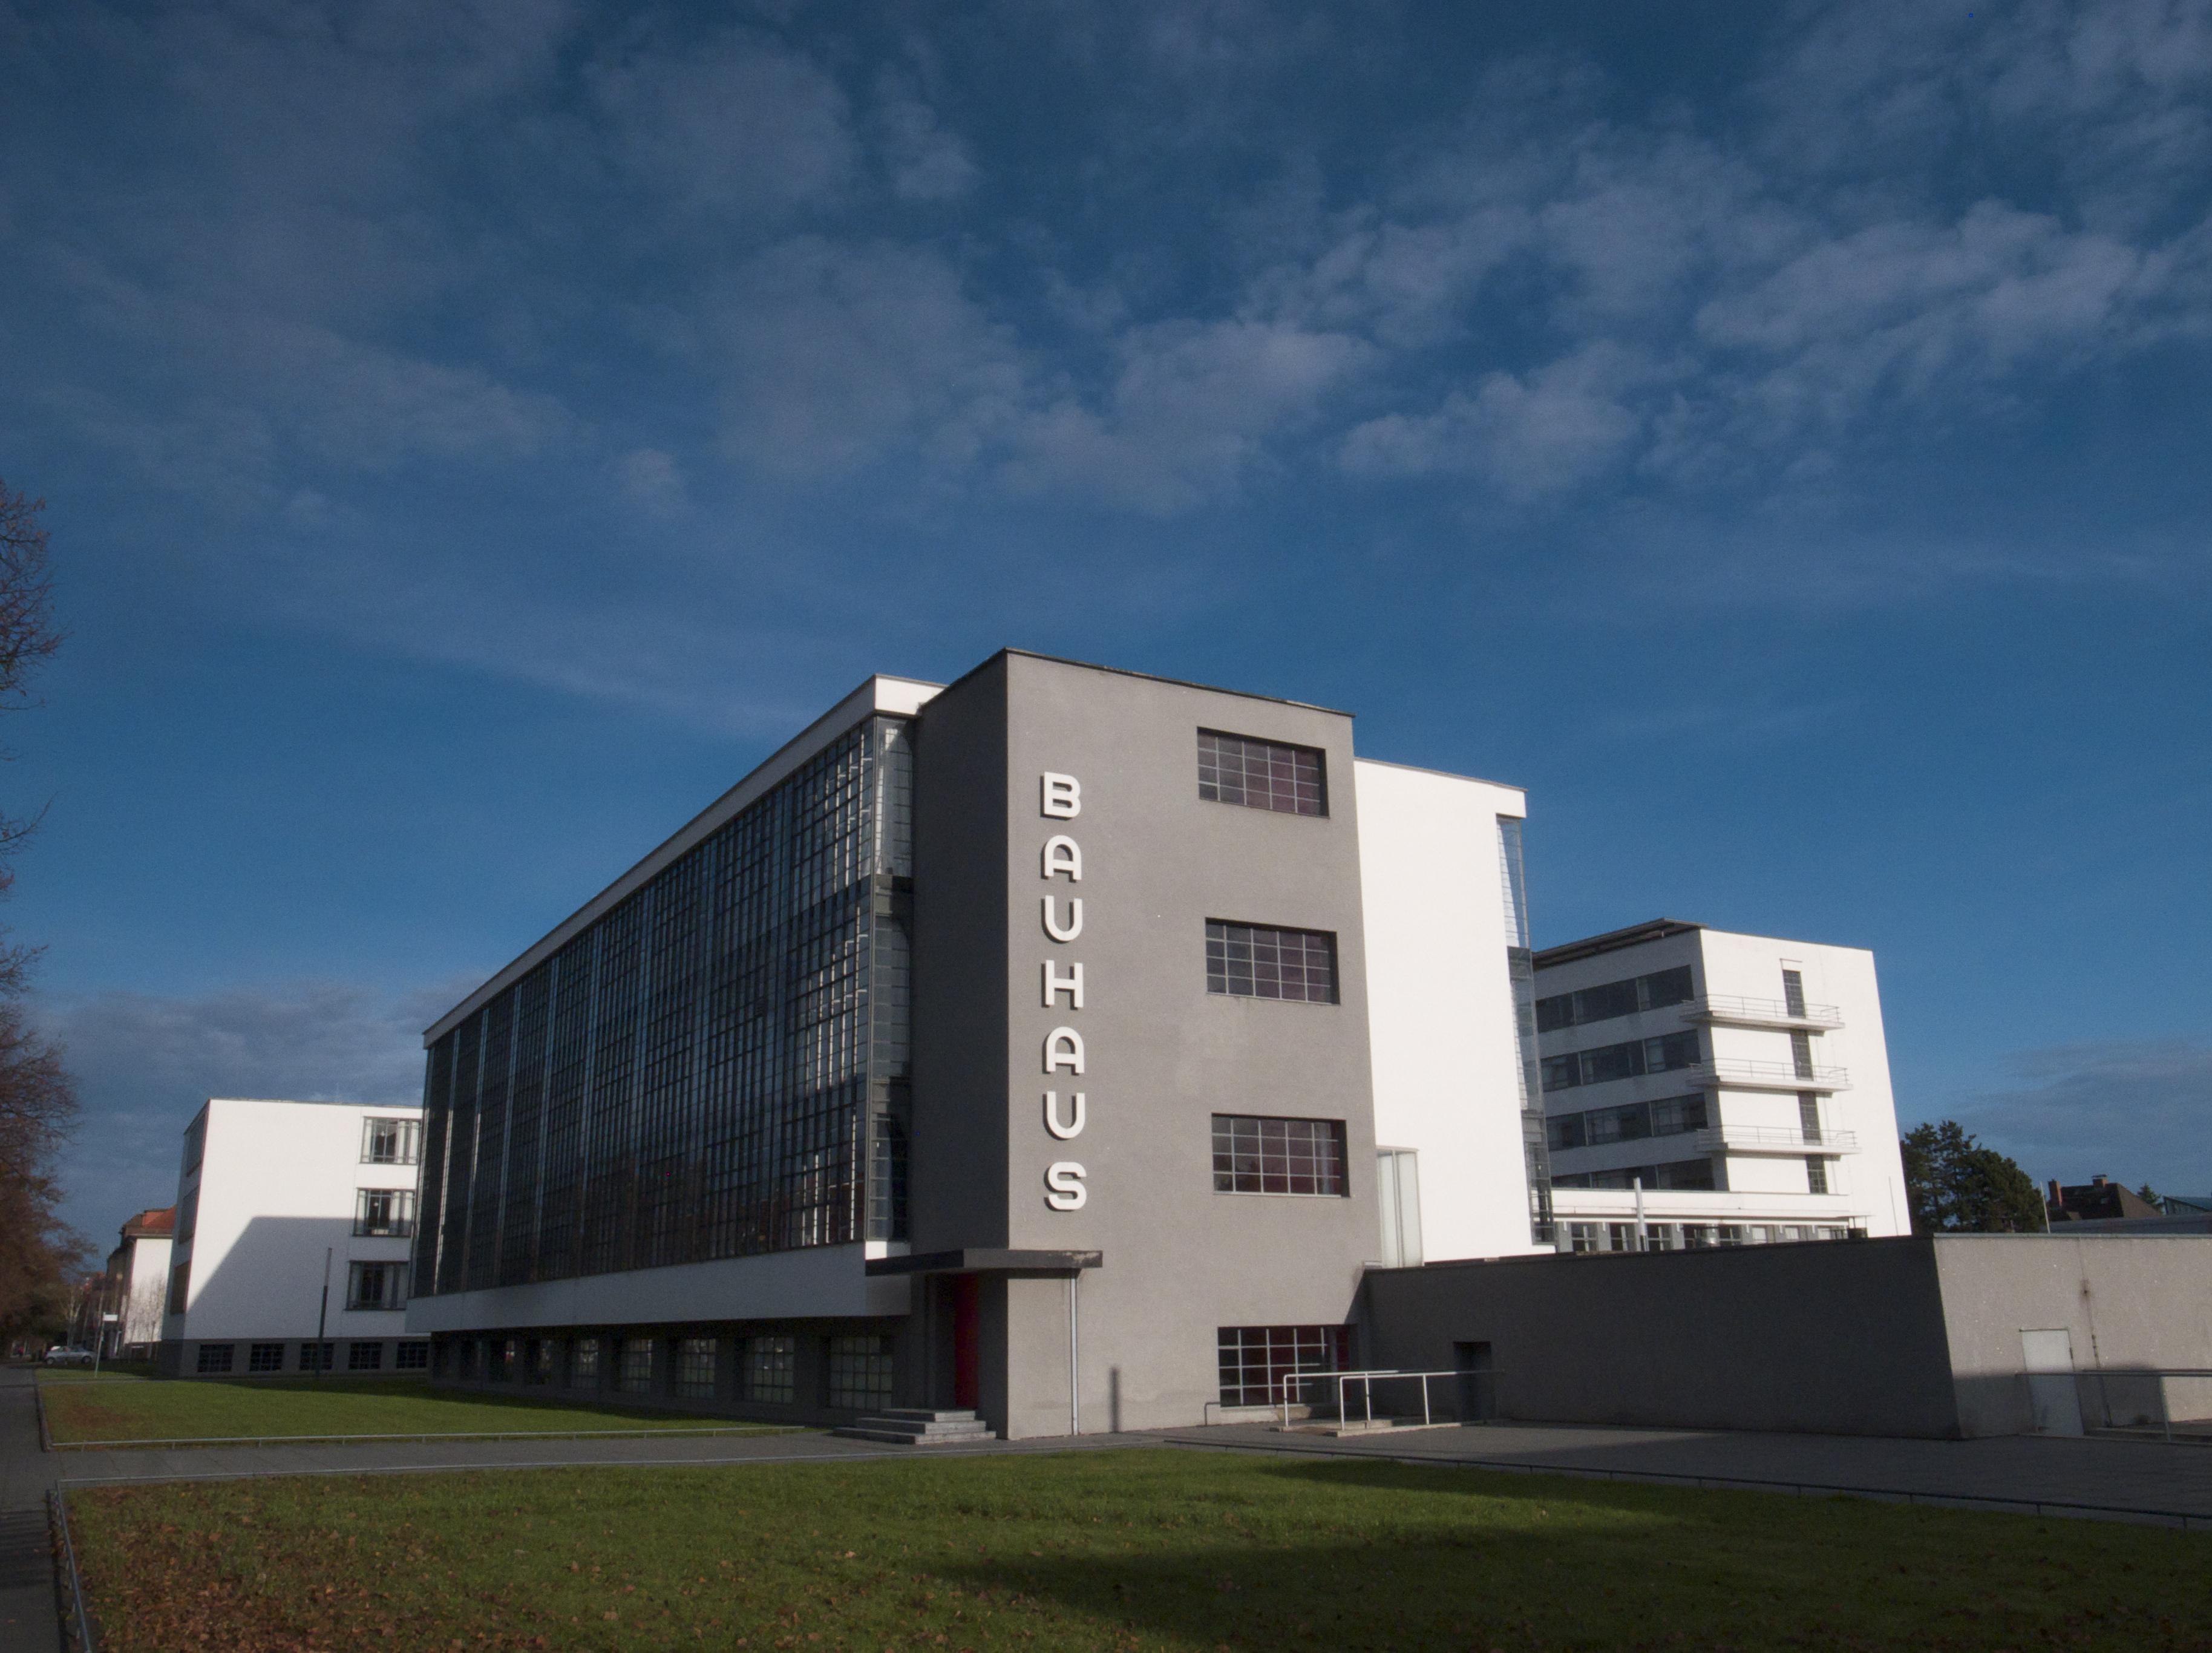 Bauhaus in Dessau / デッサウのバウハウス